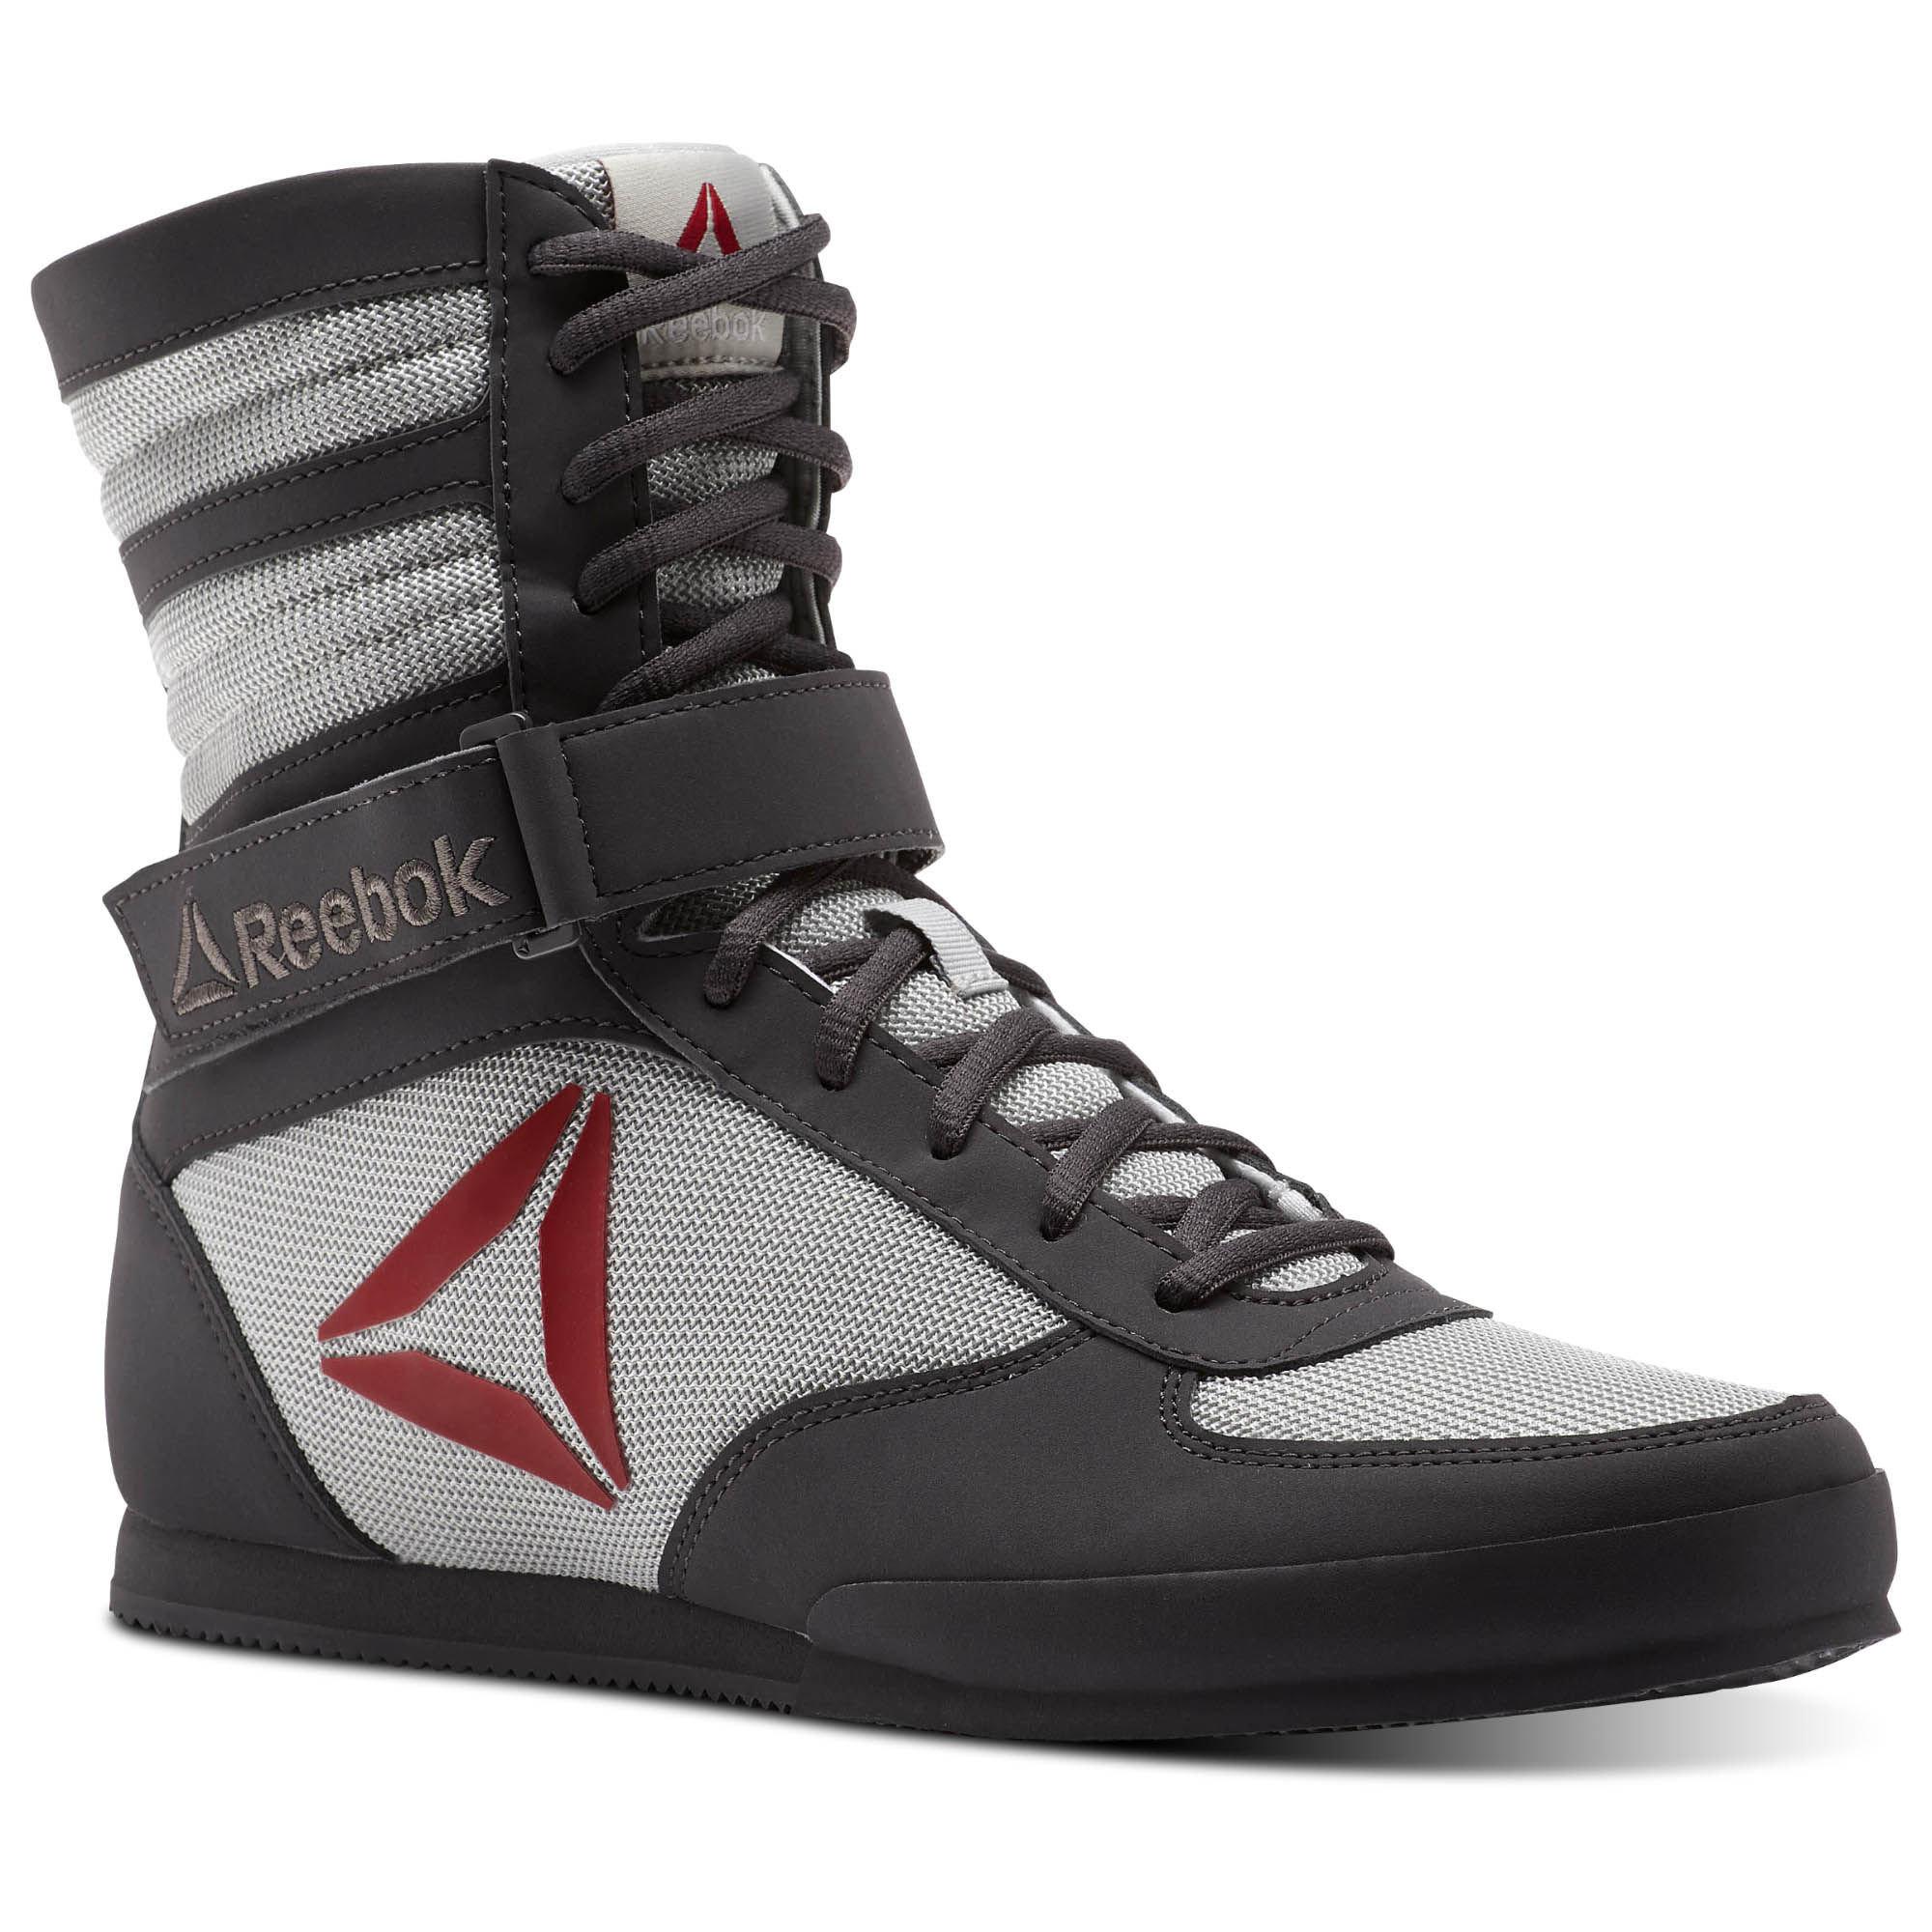 Обувь для бокса Reebok Boxing Boot Ash Grey/Skull Grey/Excellent Red/White